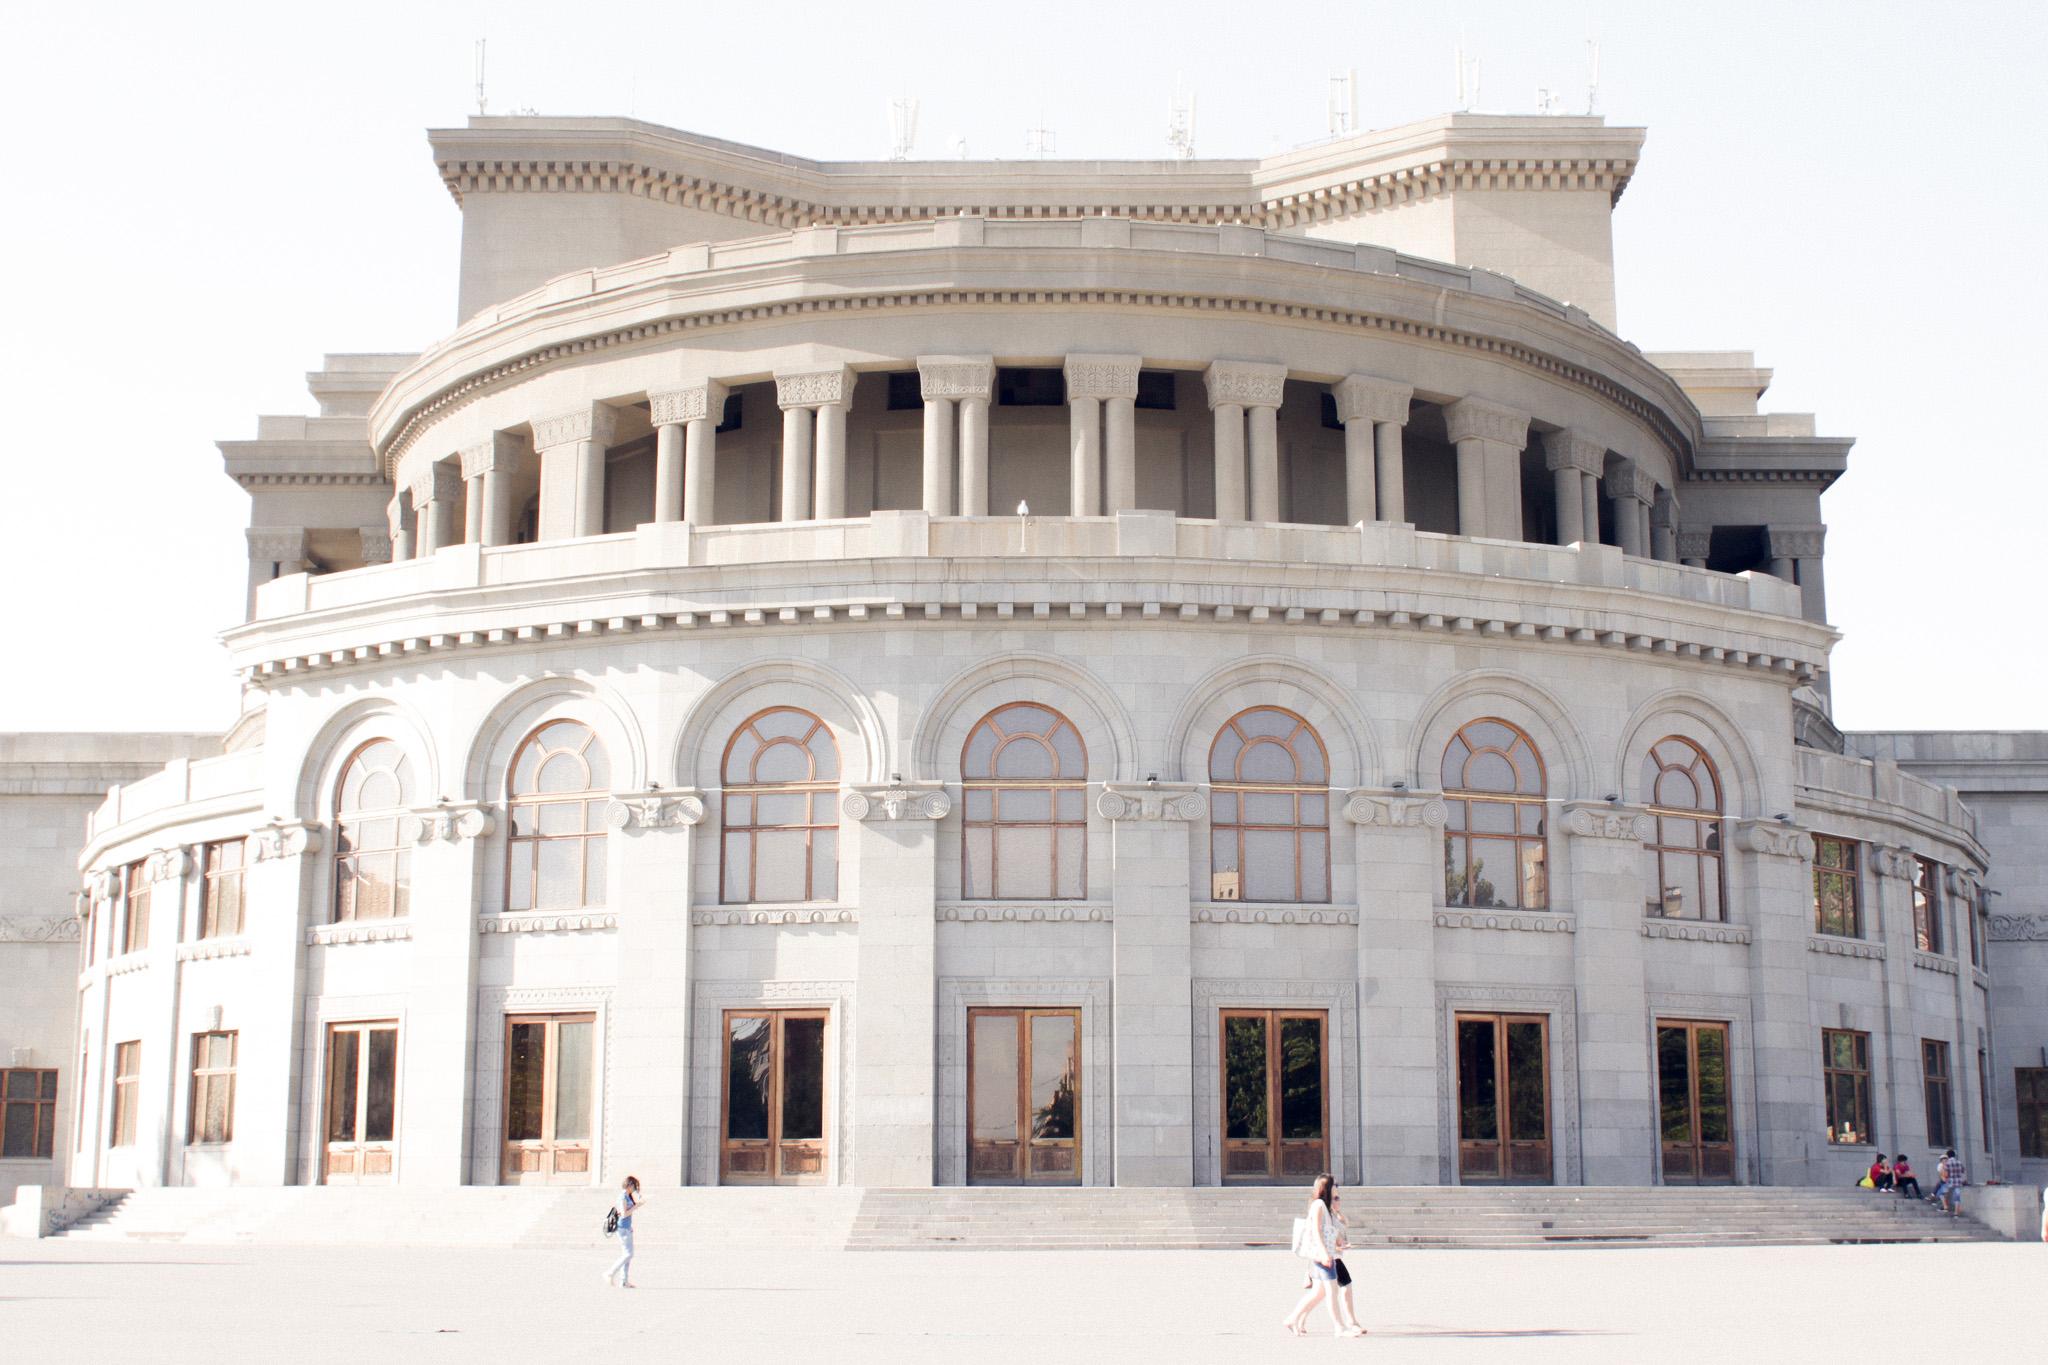 yerevan-armenia-rfm-portfolio-1.jpg